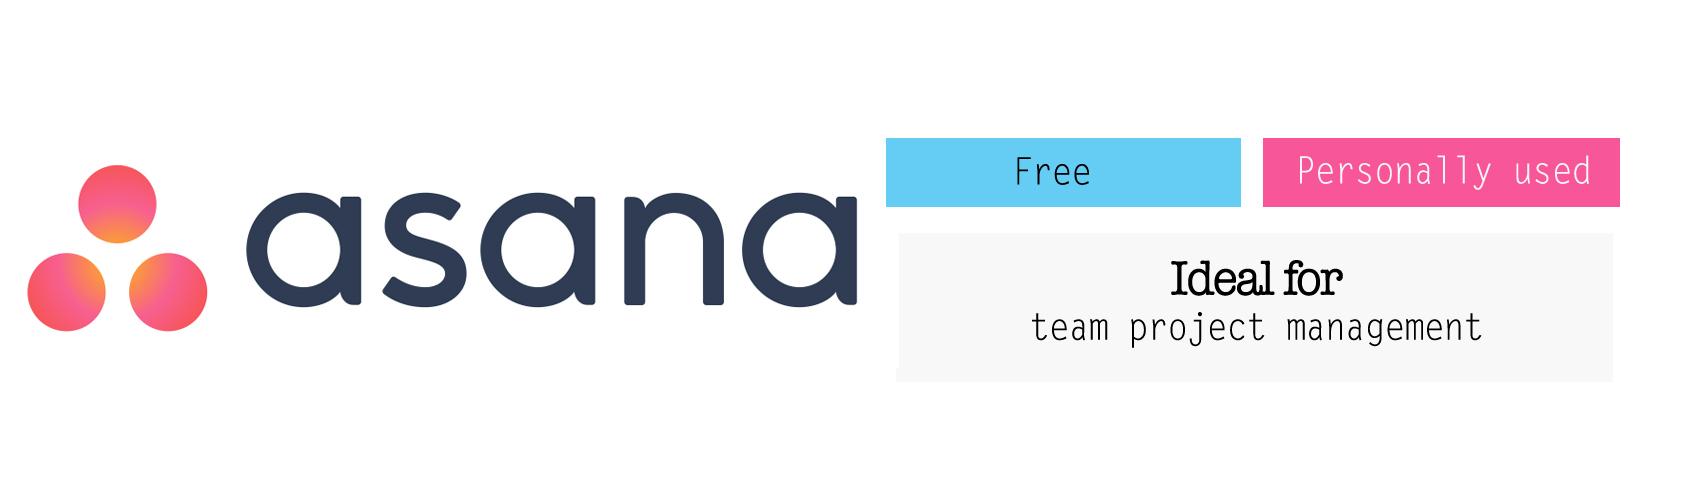 asana project management